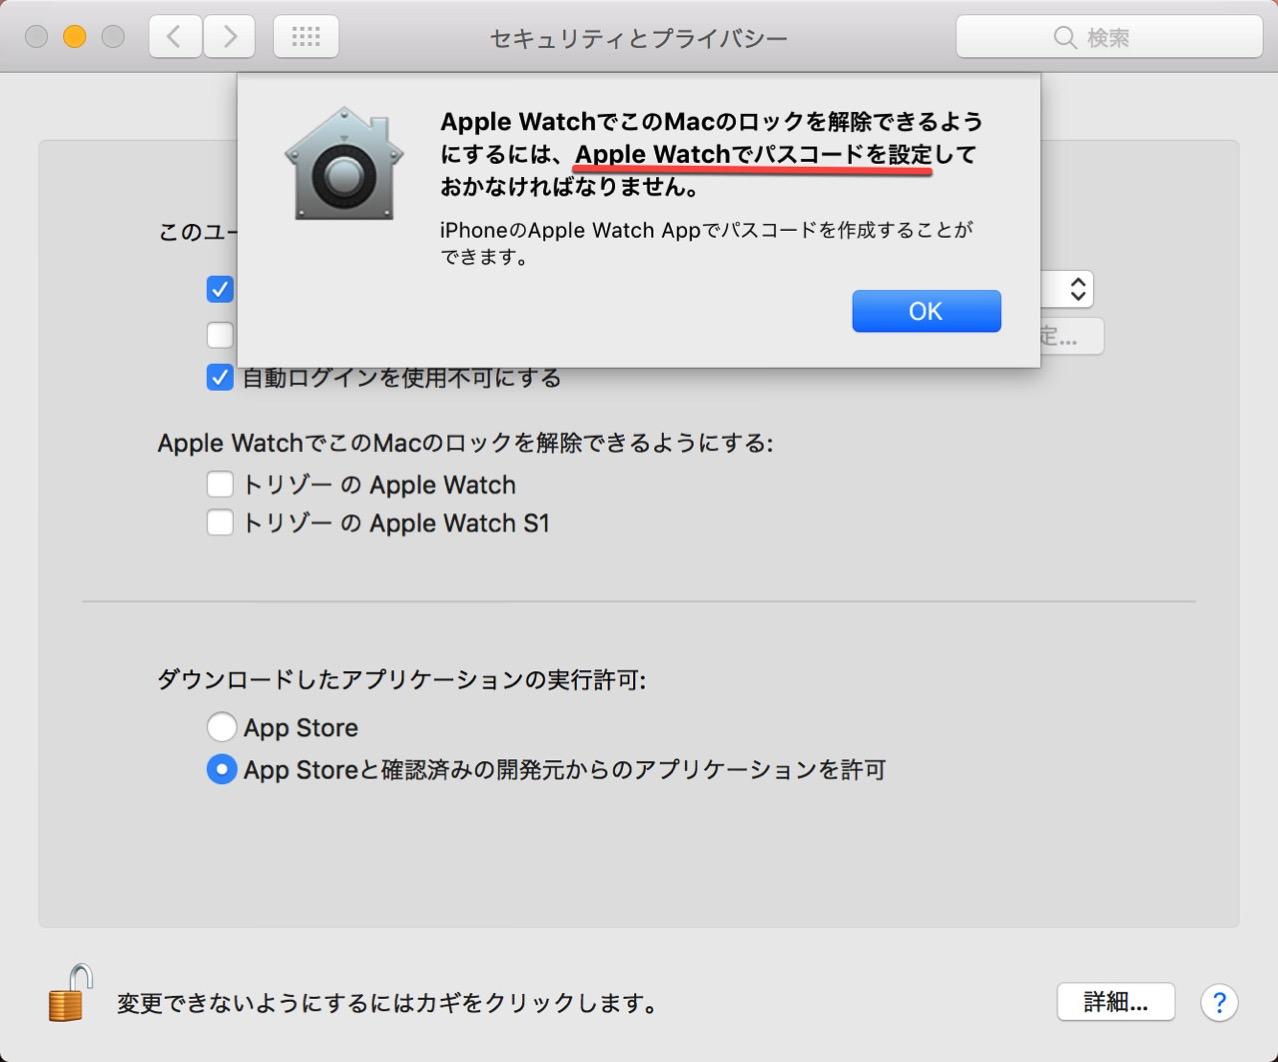 How to unlock mac apple watch2